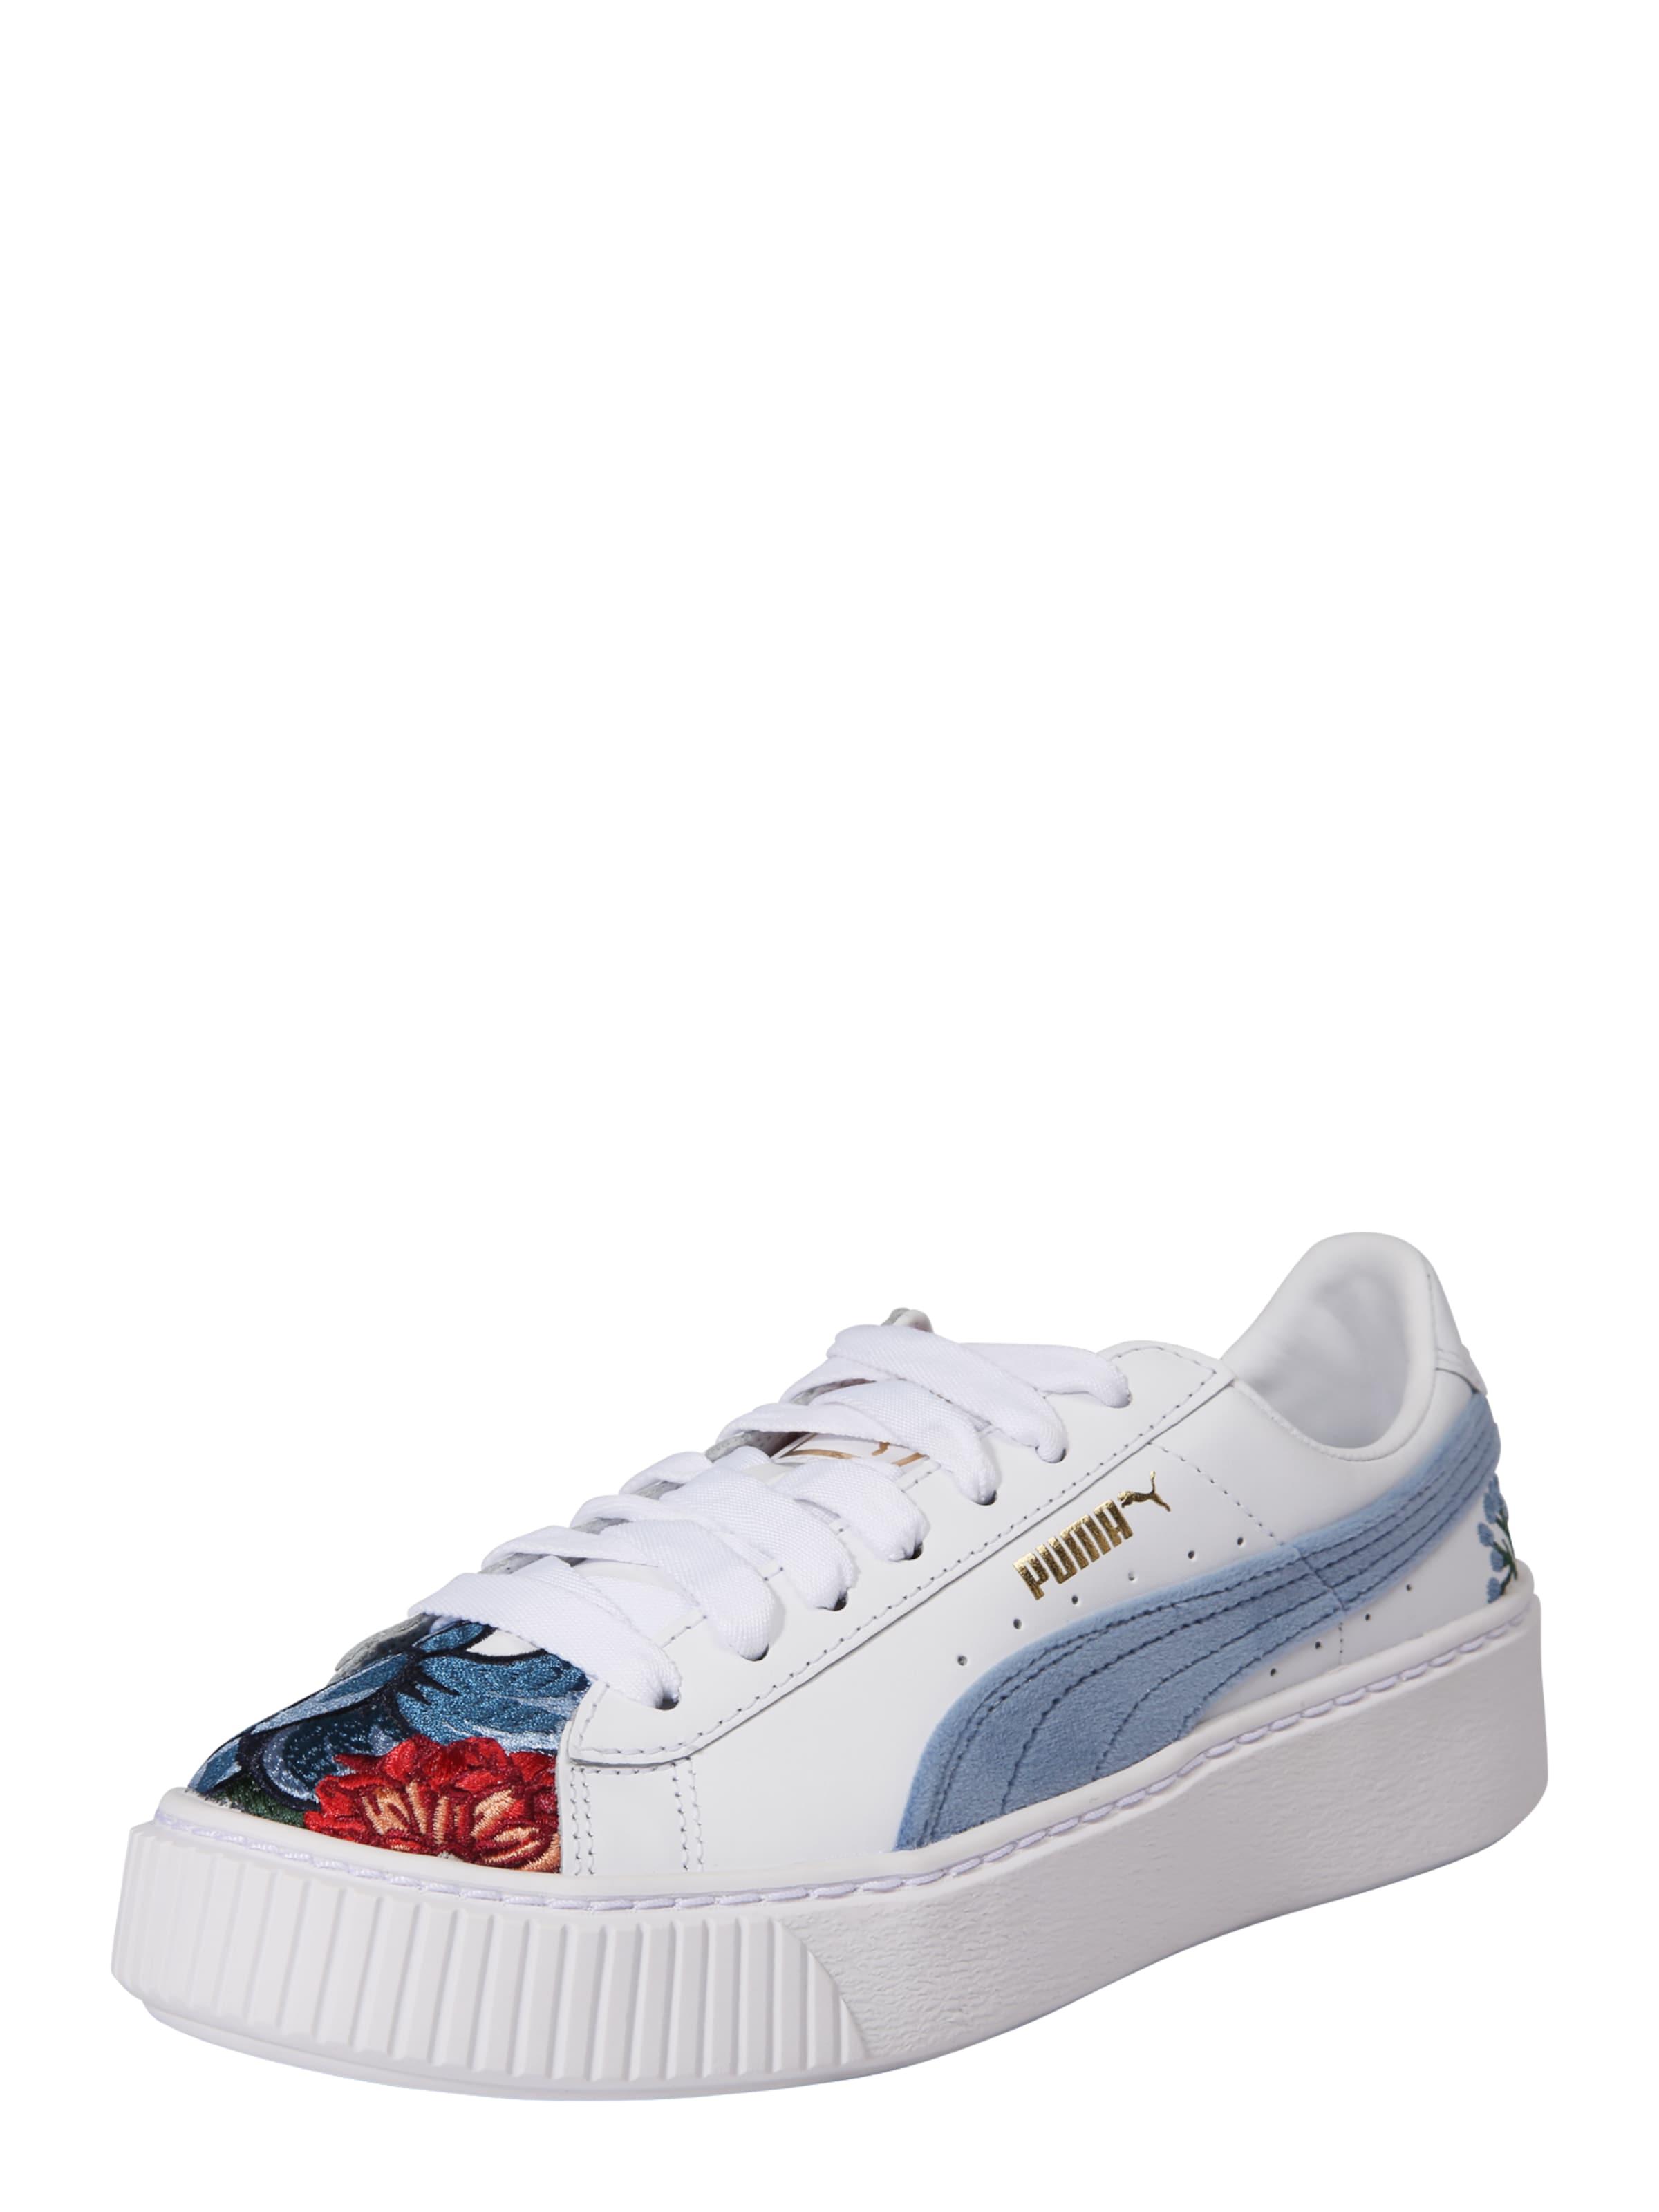 Puma Sneakers Bas Hyper « Blanc Qrvu0Qg